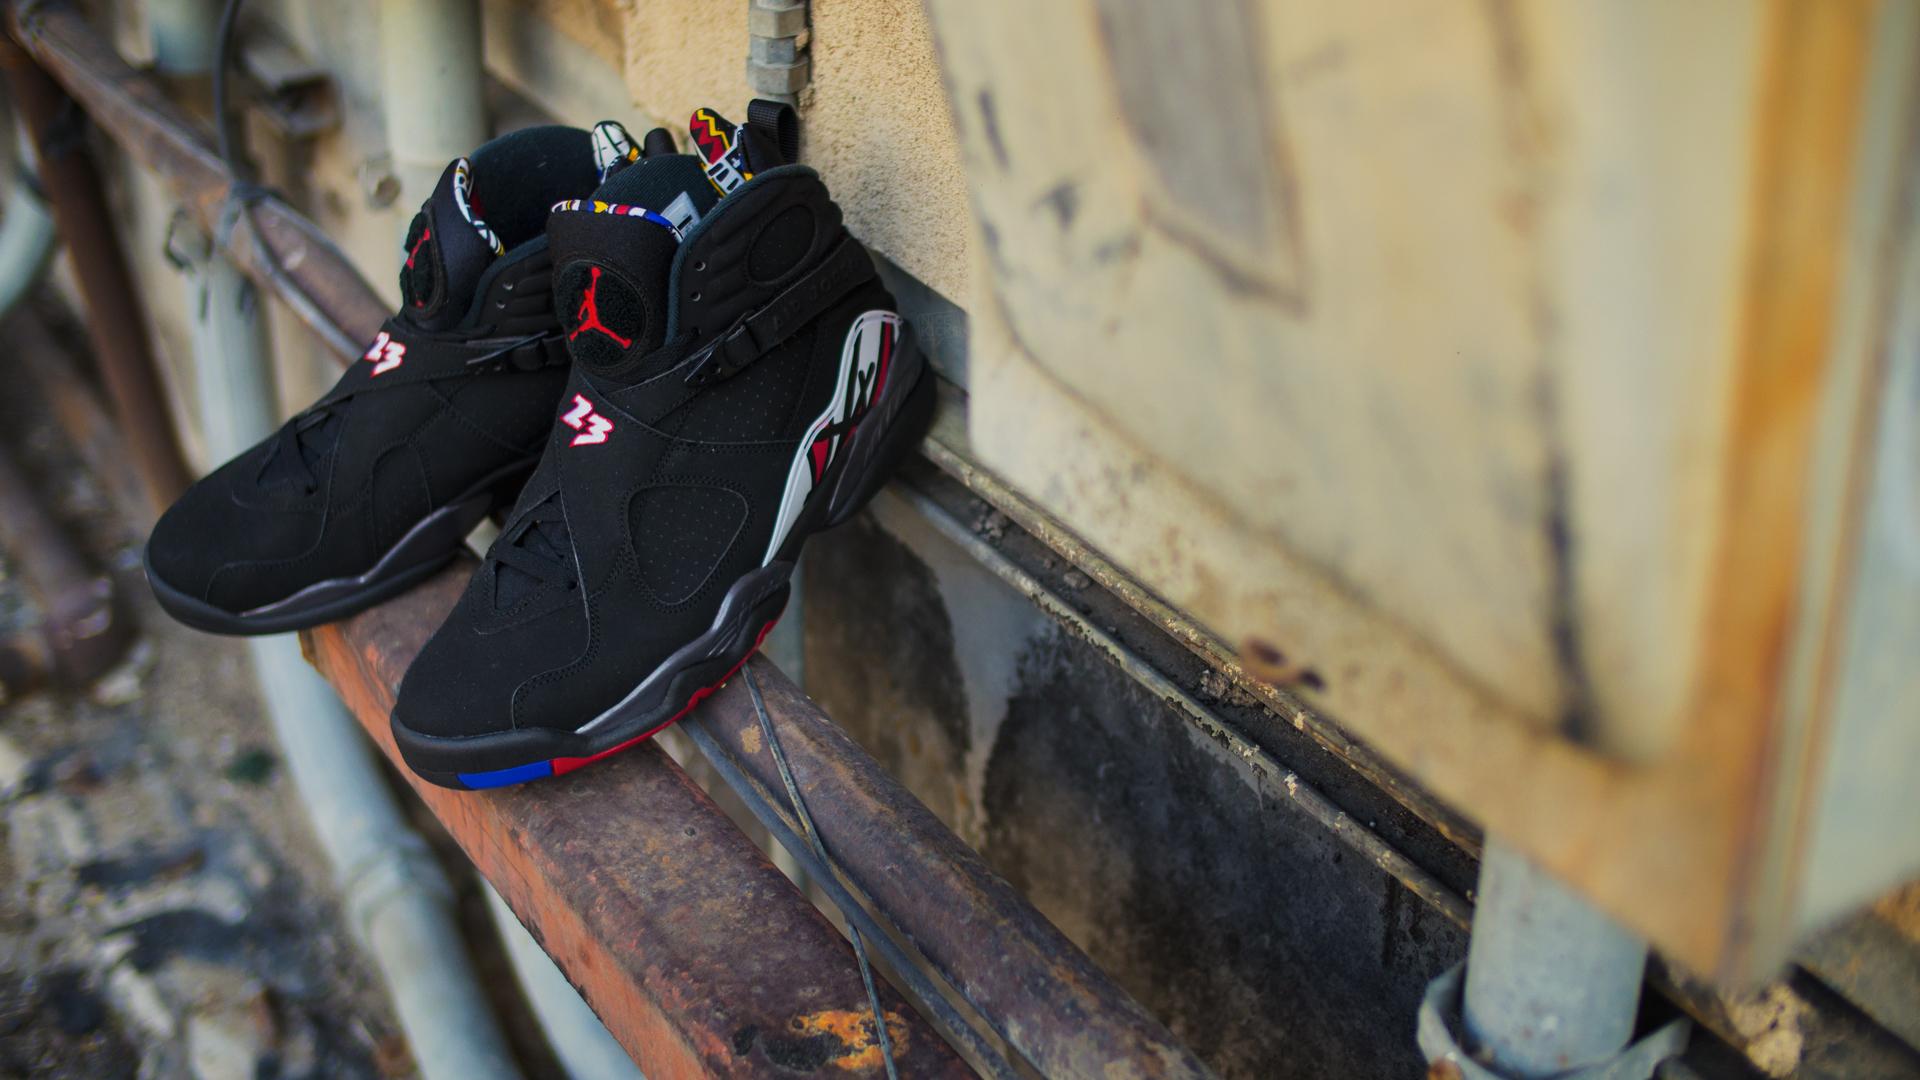 jordan shoes wallpaper 30672